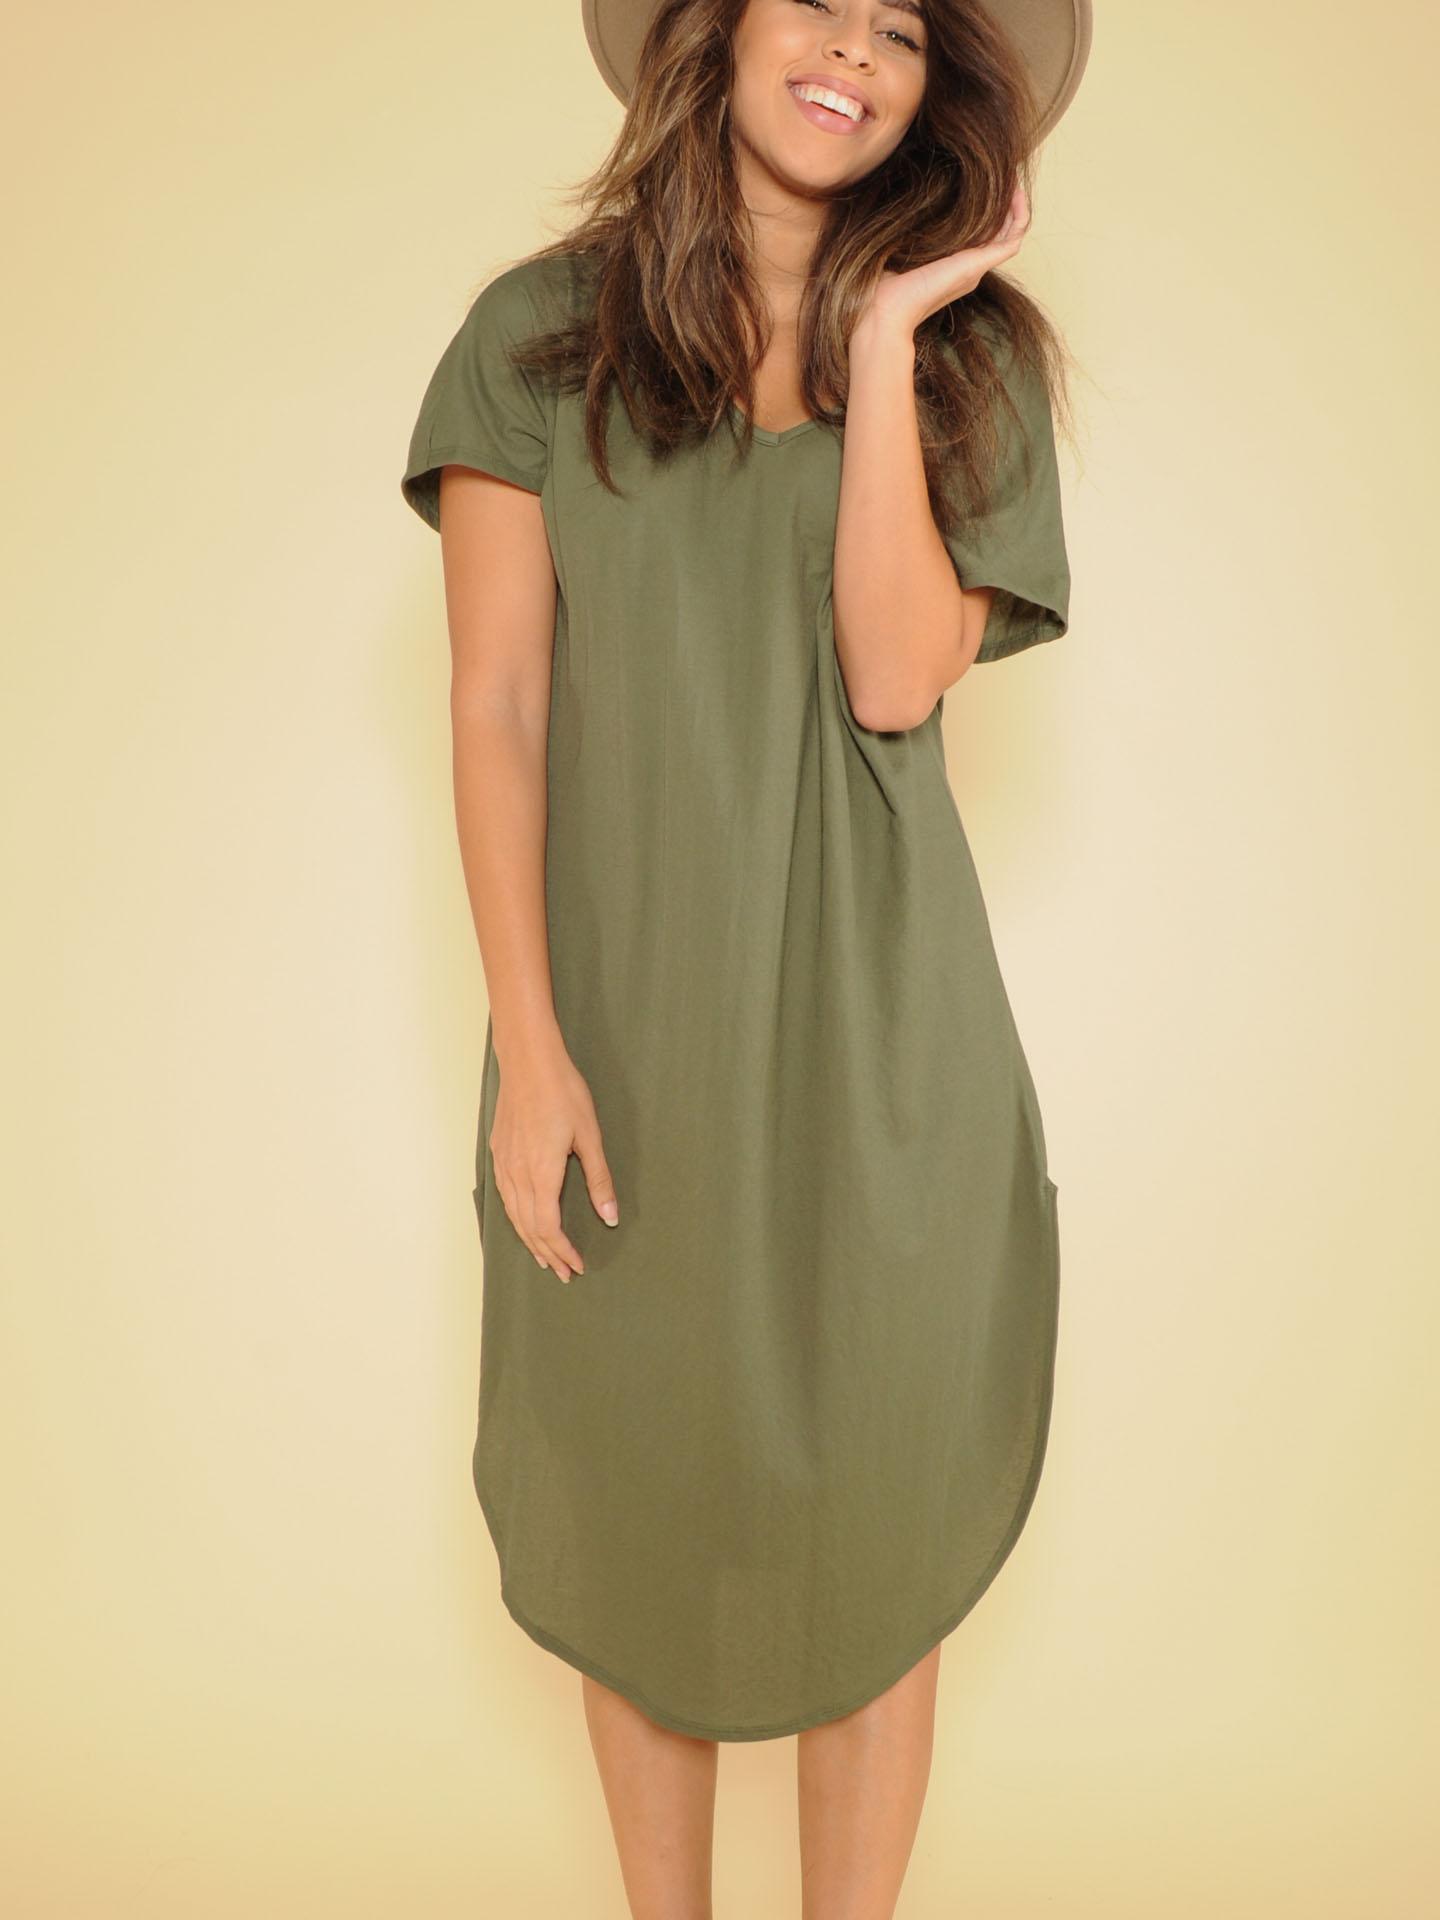 Manny Tee Dress Basic Maxi V Neck Olive Front